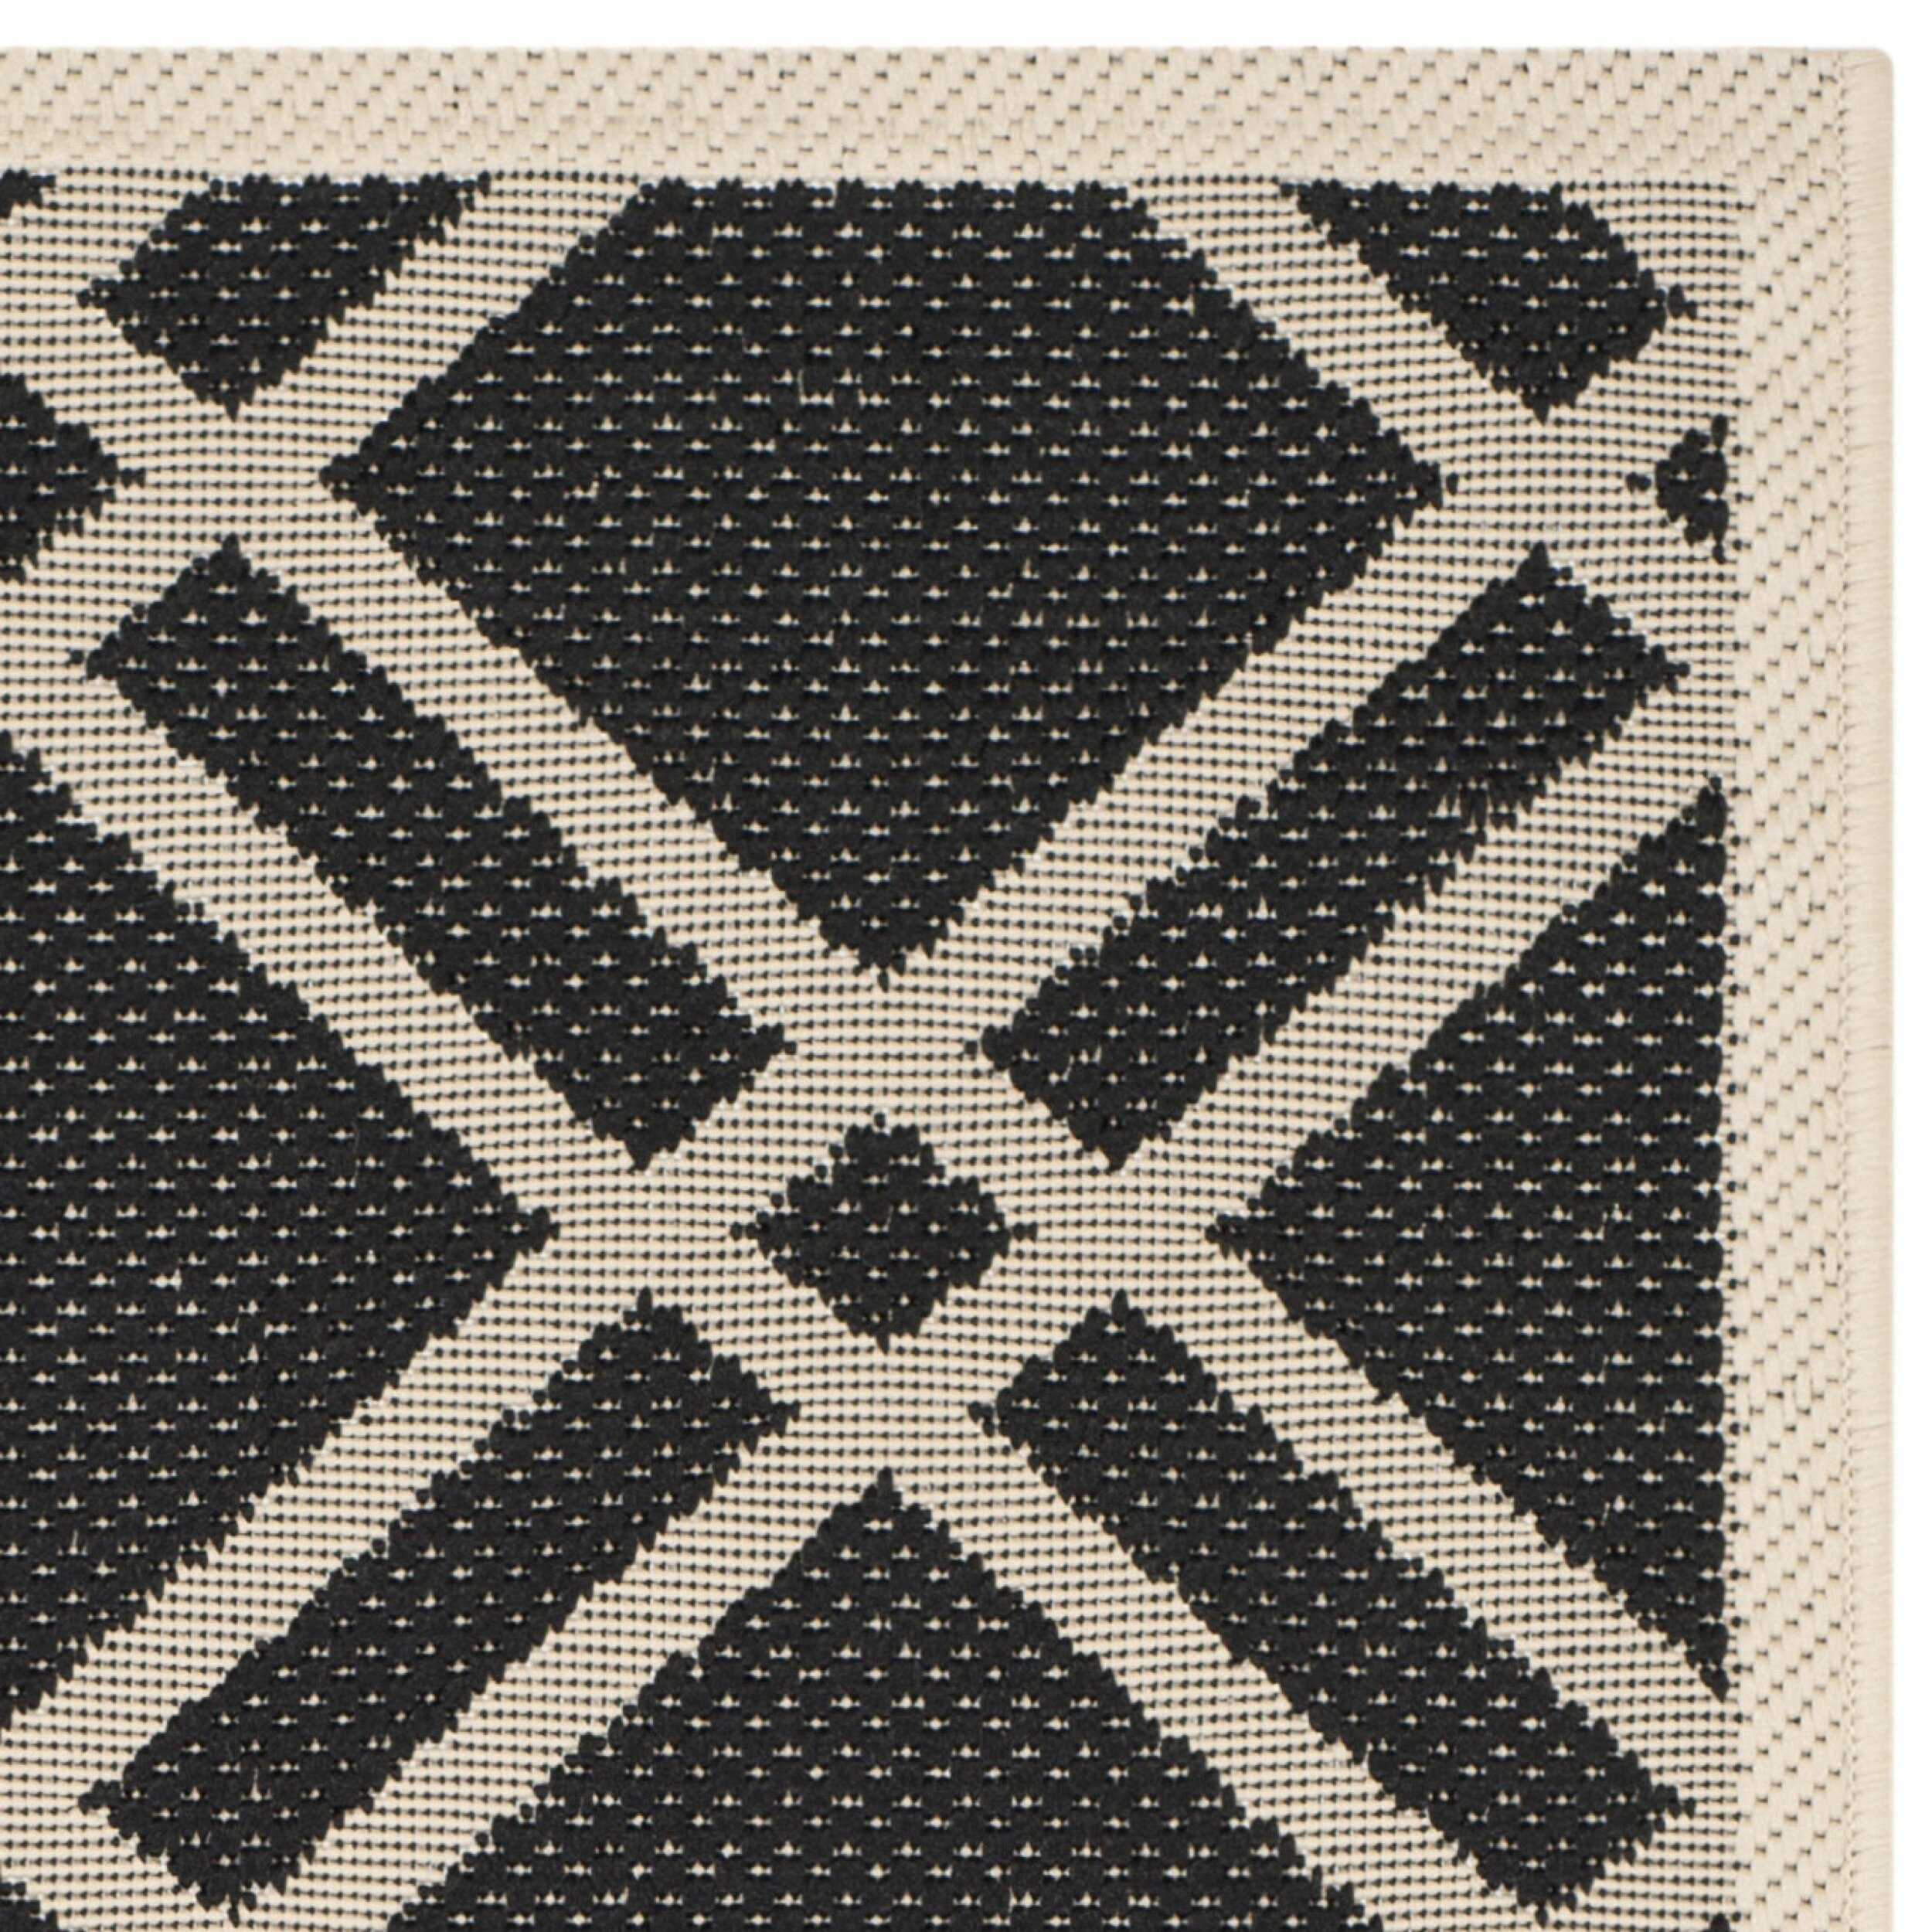 Black And White Rug Outdoor: Safavieh Courtyard Black/Beige Outdoor Rug & Reviews